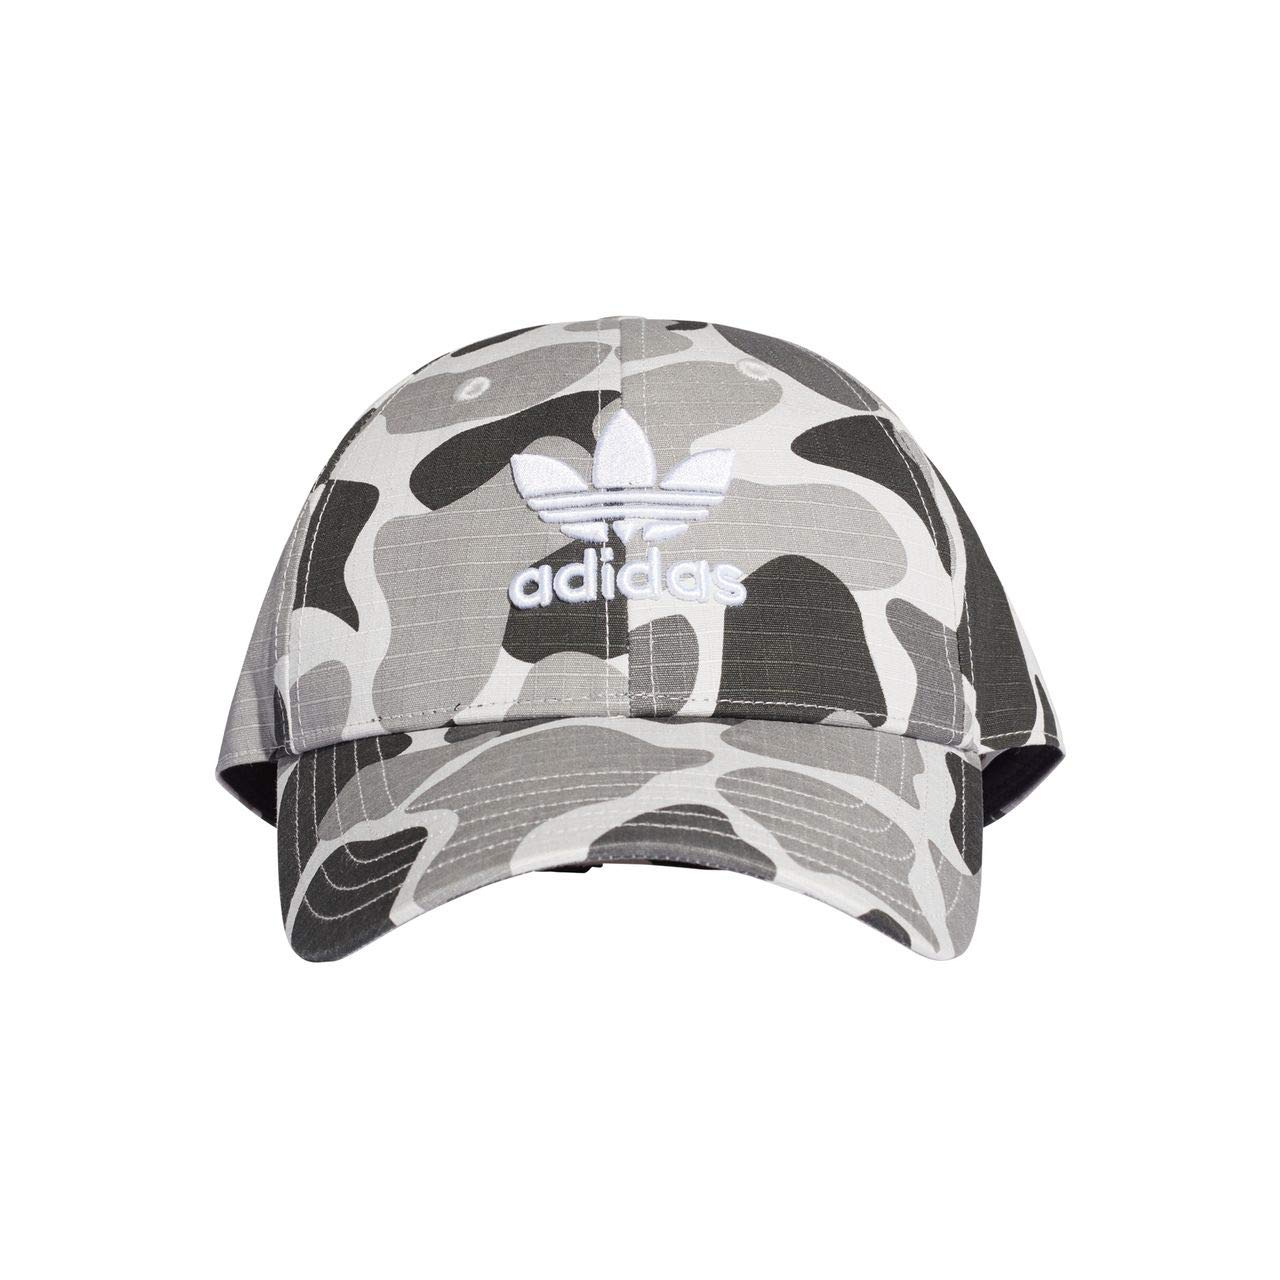 8ca12ebc771 adidas Cap - Classic Camo Grey Black Multicolor Size  OSFL (One Size fits  Any)  Amazon.co.uk  Clothing